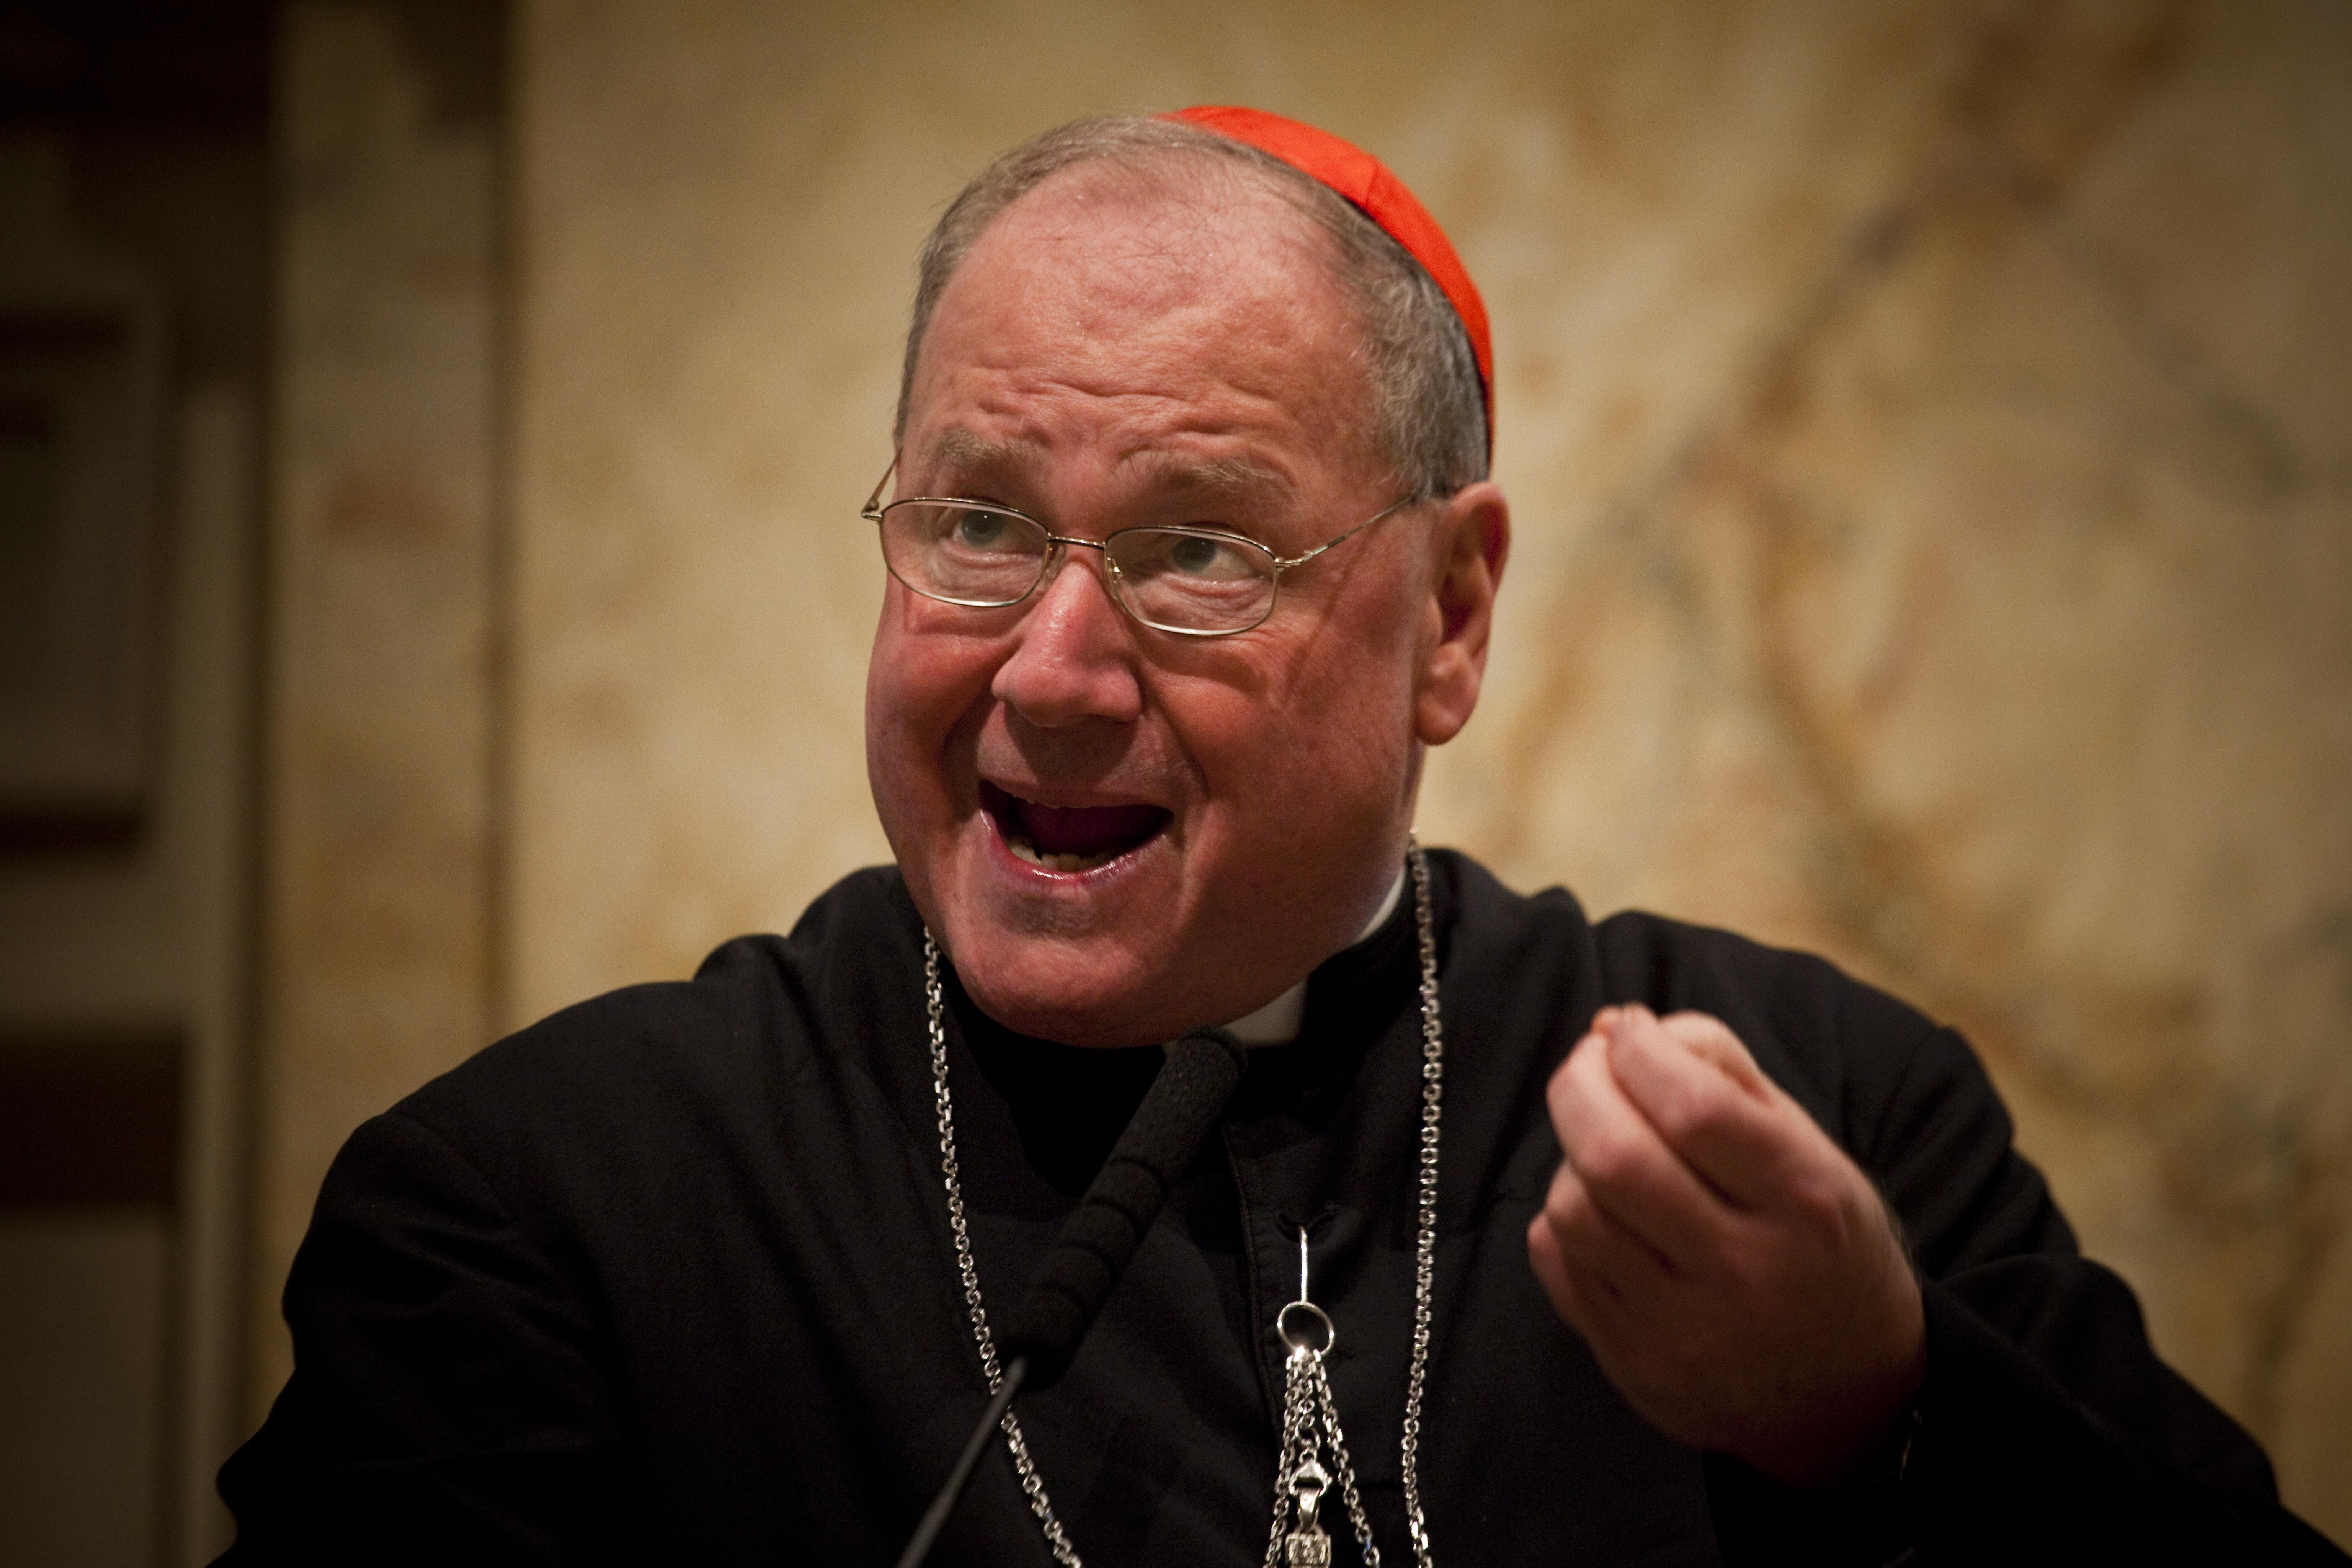 Cardinal Timothy Dolan  (Photo: Michael Nagle/Getty Images)